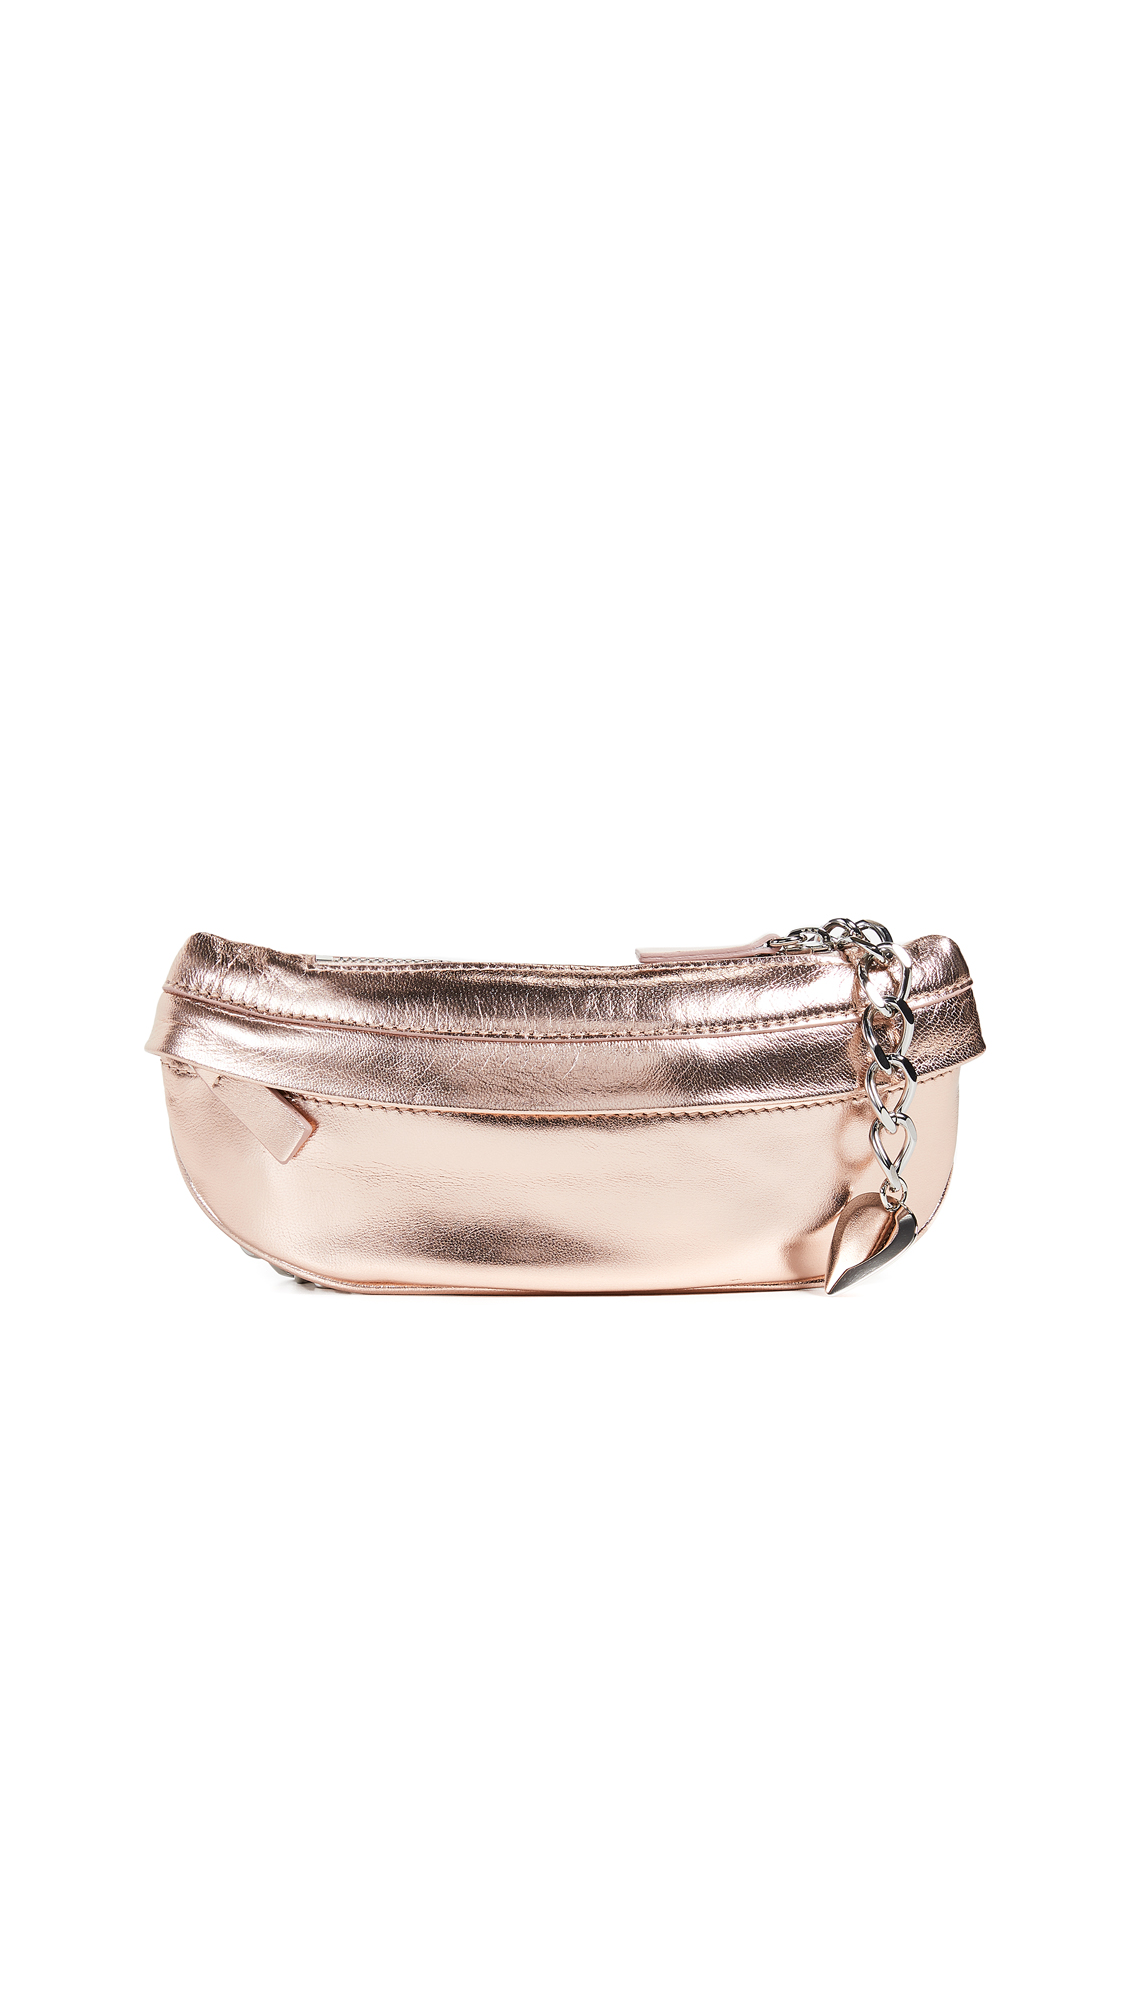 AVEC LA TROUPE Troupe Belt Bag in Rose Gold